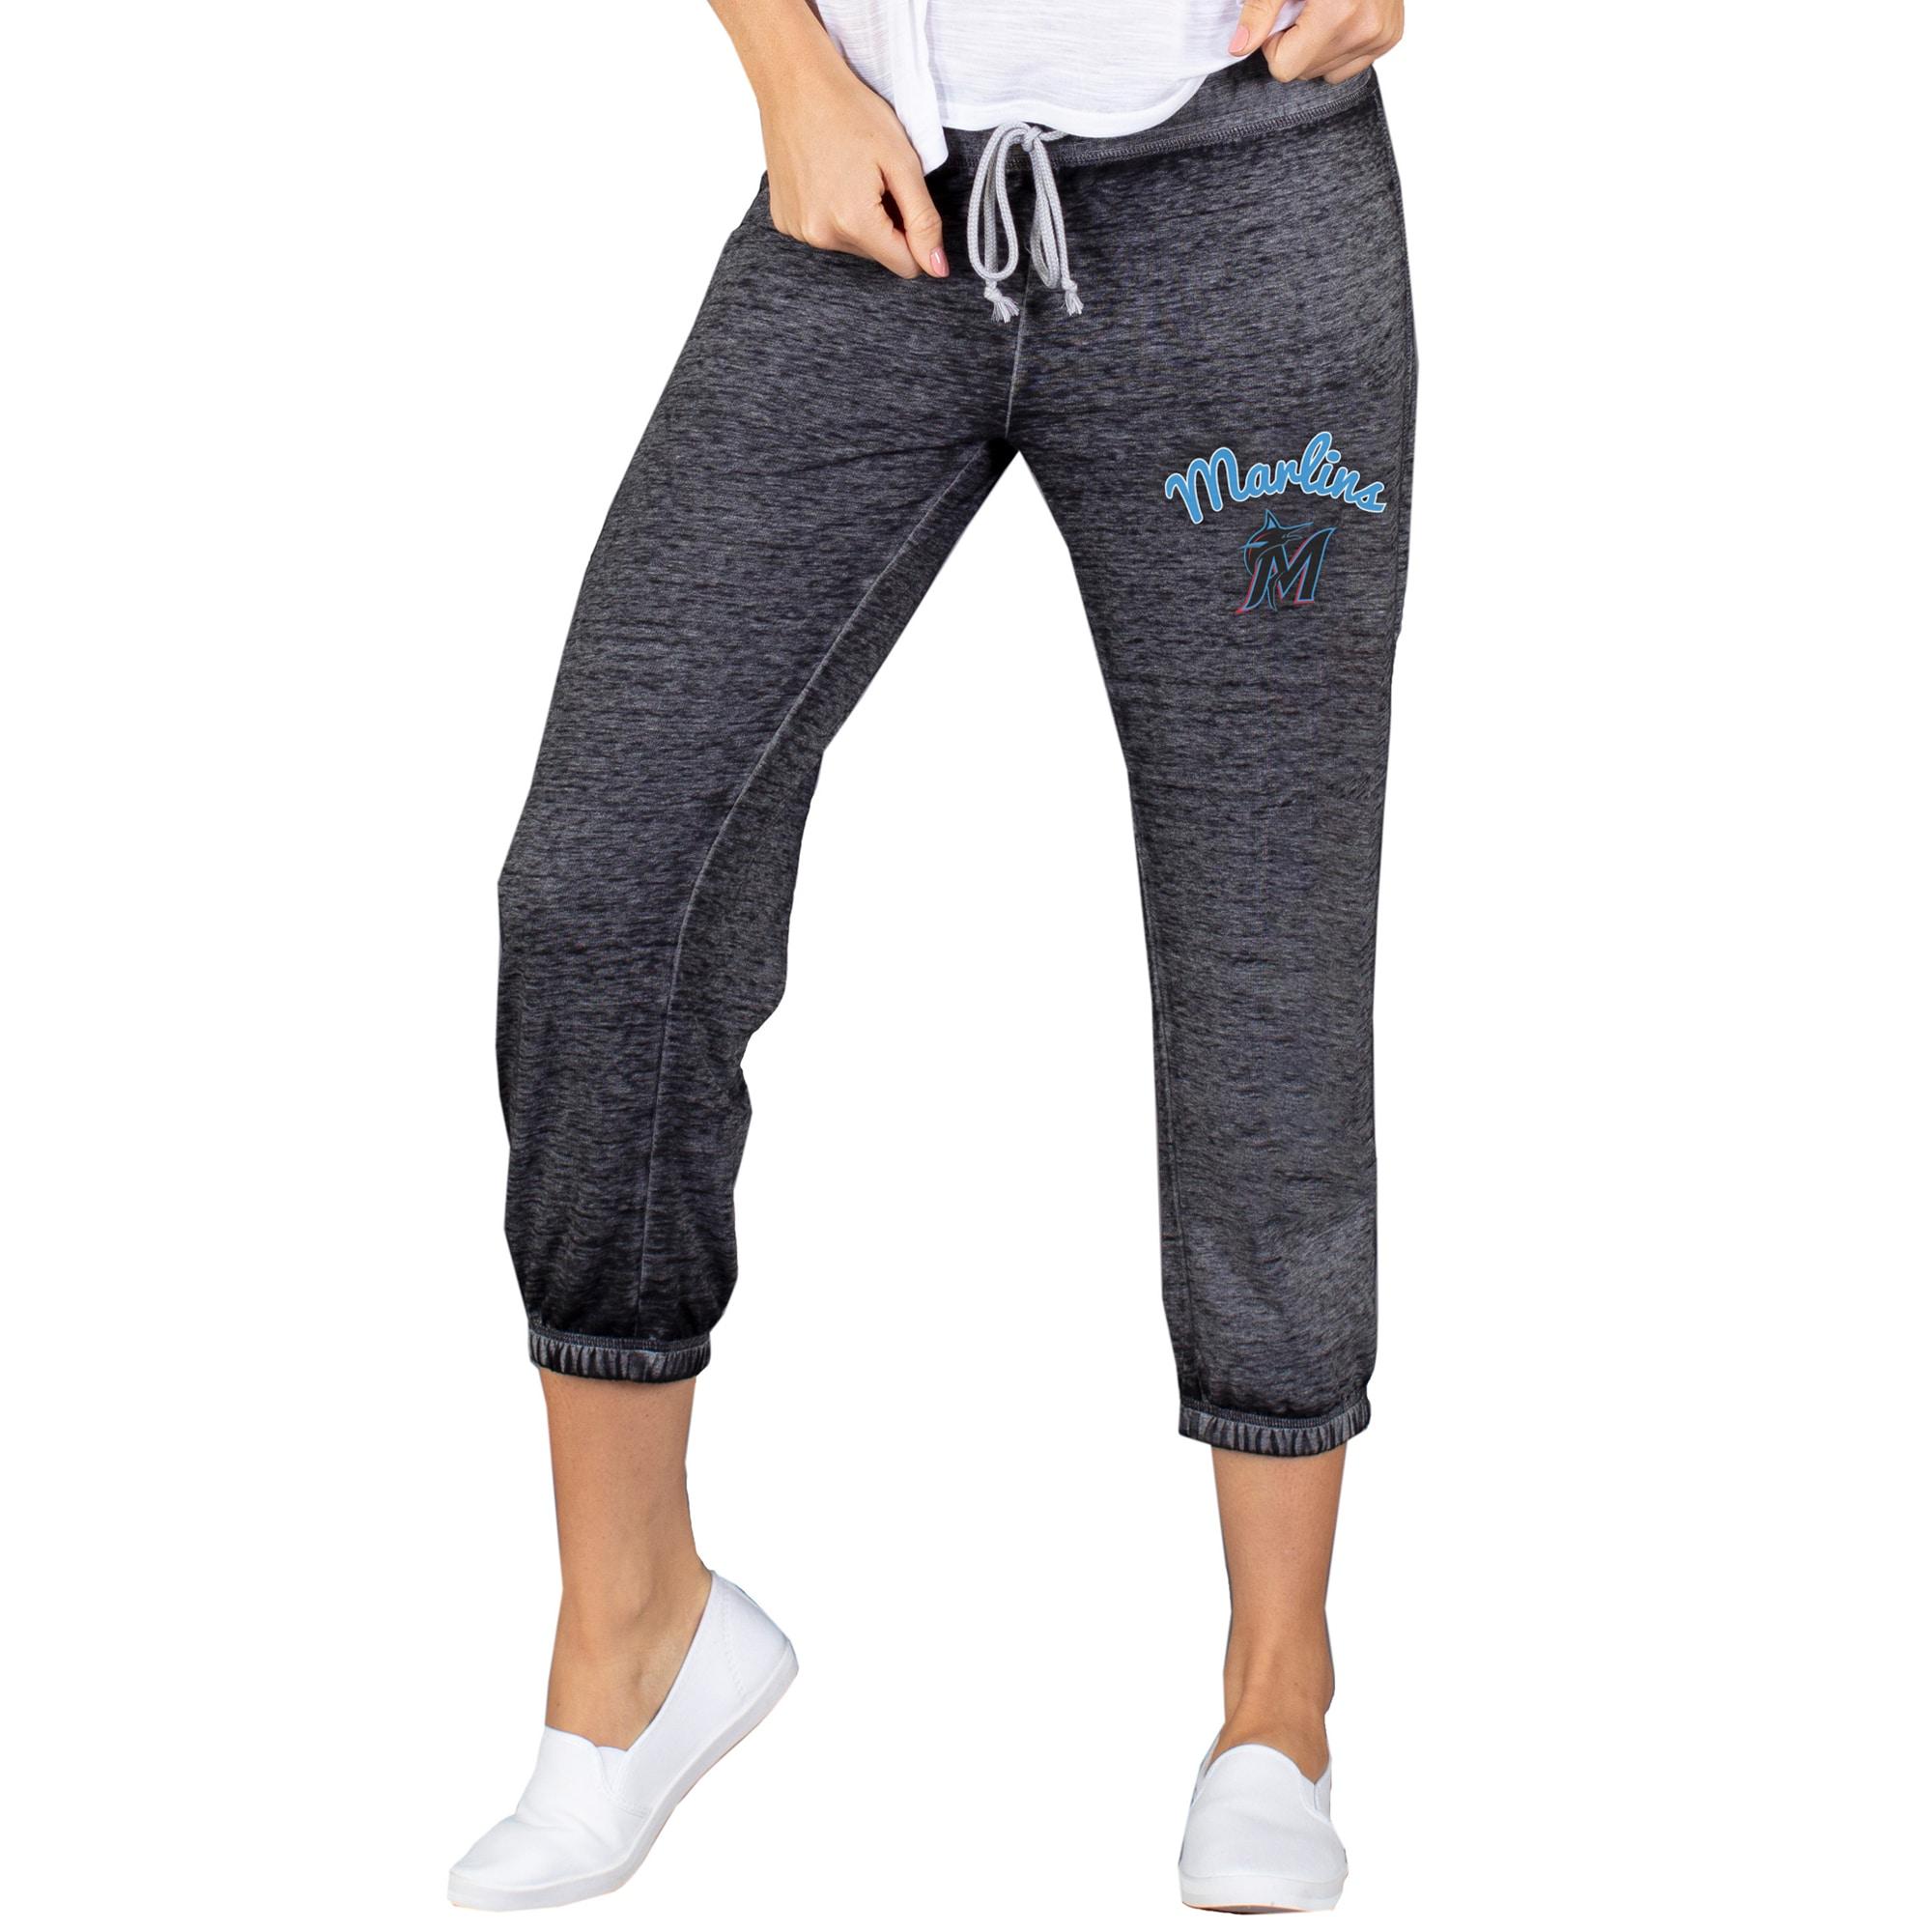 Miami Marlins Concepts Sport Women's NBO Knit Capri Pants - Charcoal